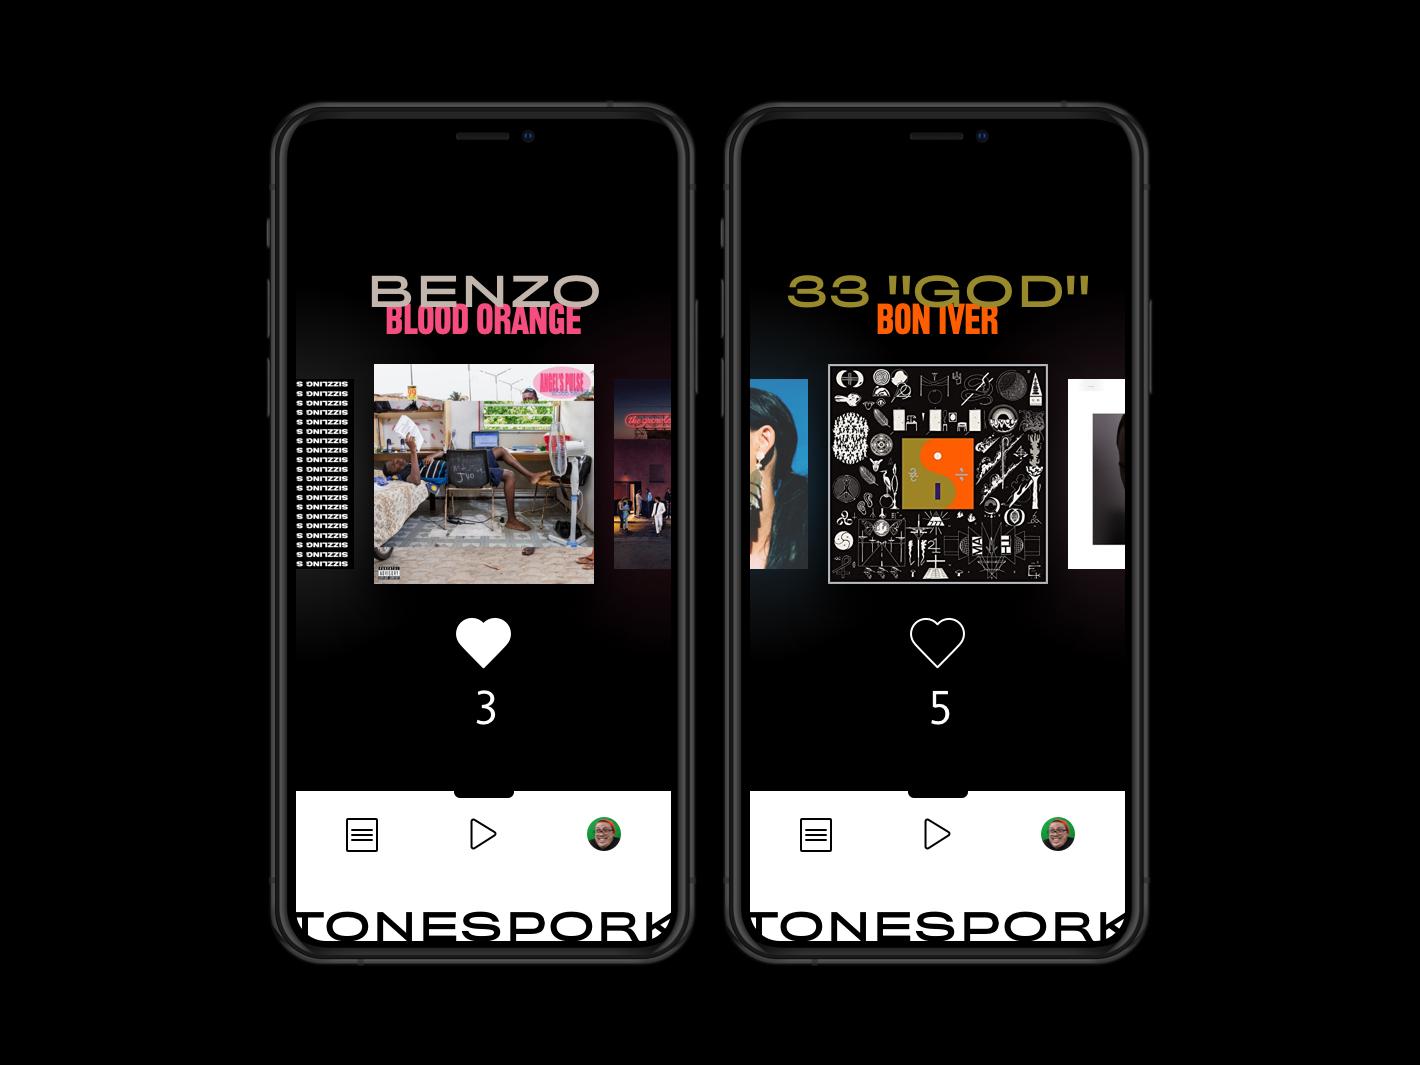 TONESPORK Brand Book - App app design application type ux spotify design music app branding typography brand userexperience musicapp uidesign ui  ux ui app